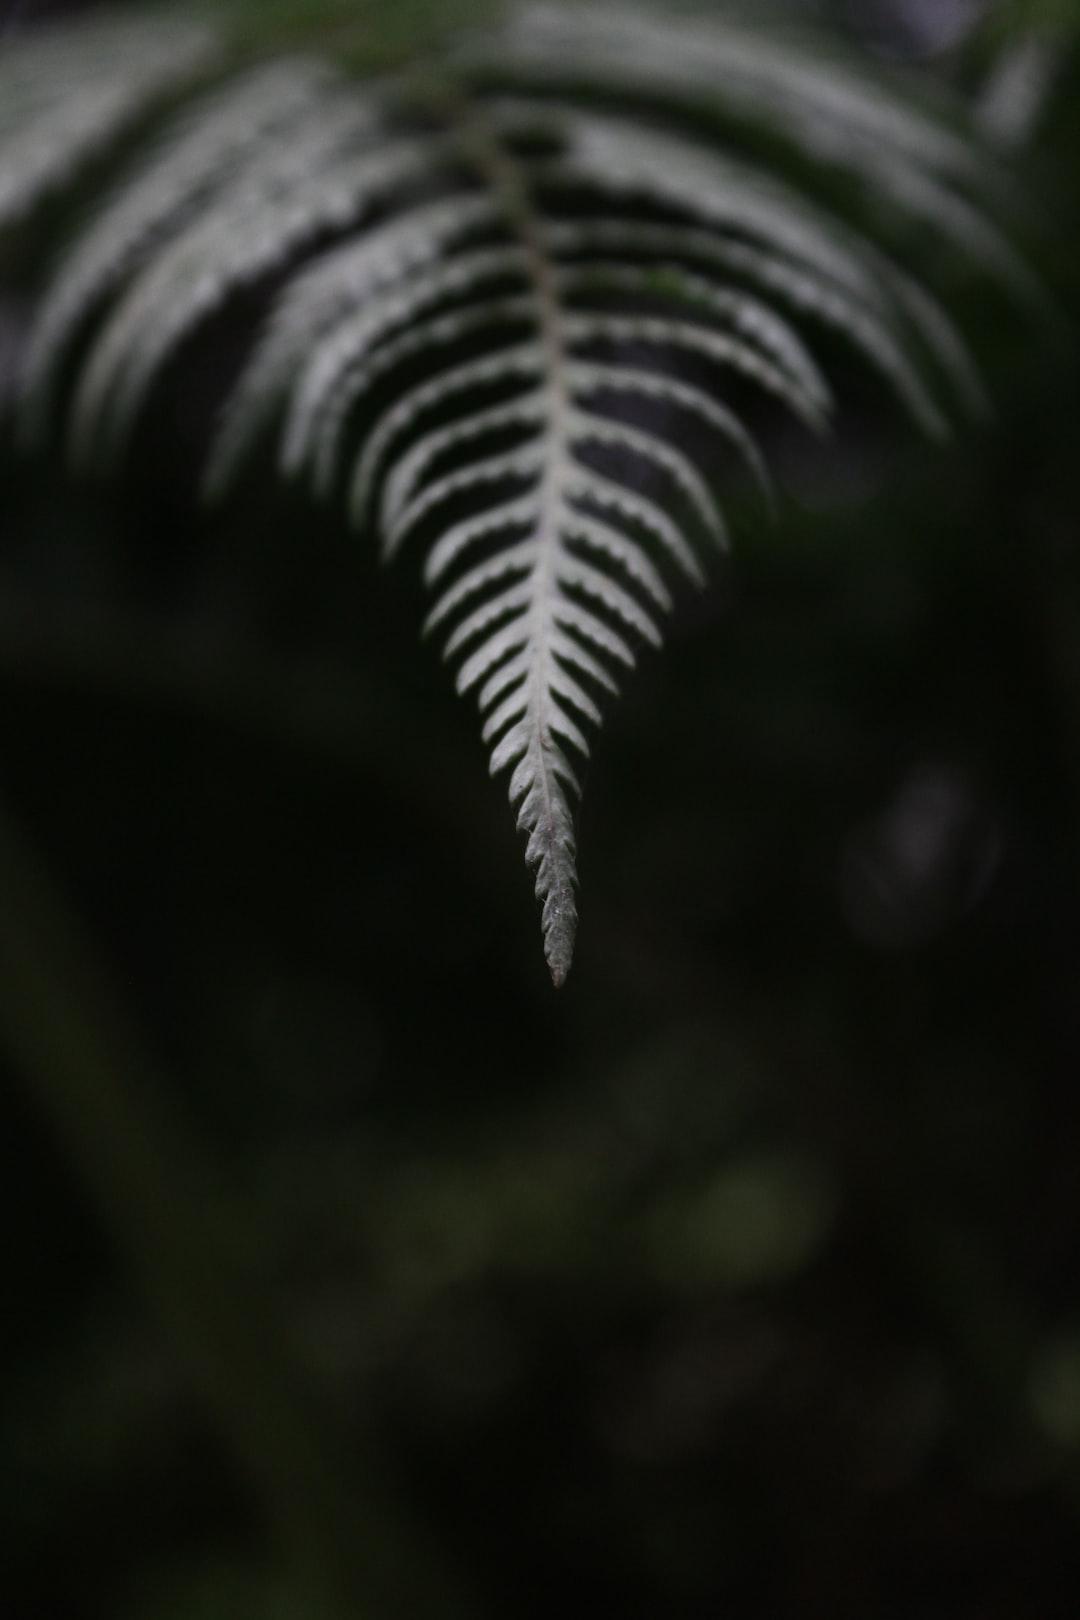 Fern leaf macro